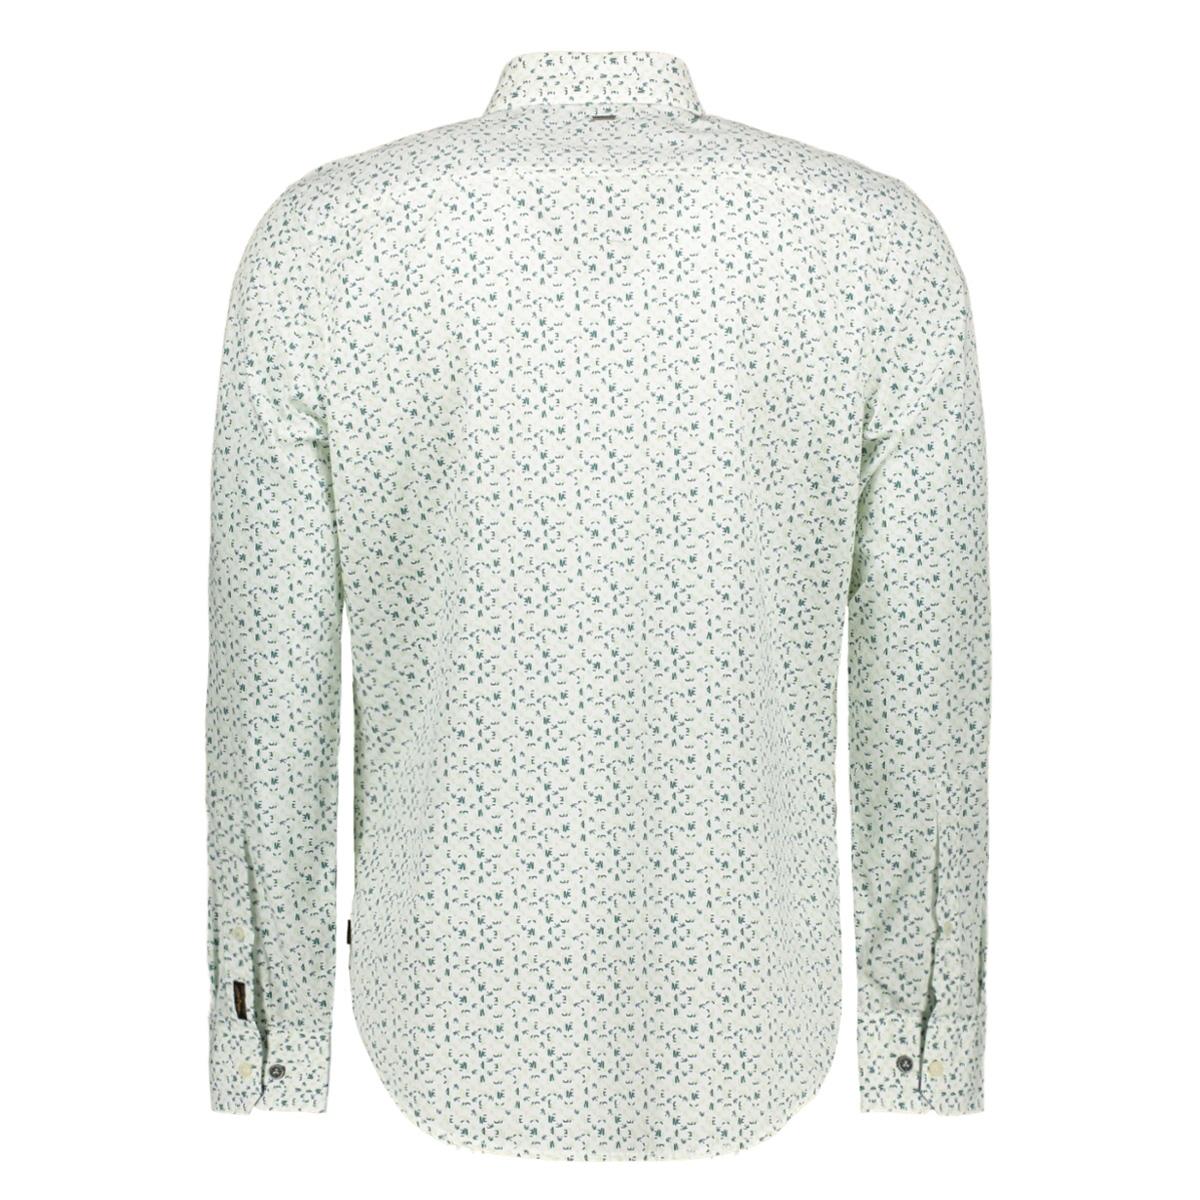 psi191202 pme legend overhemd 7003